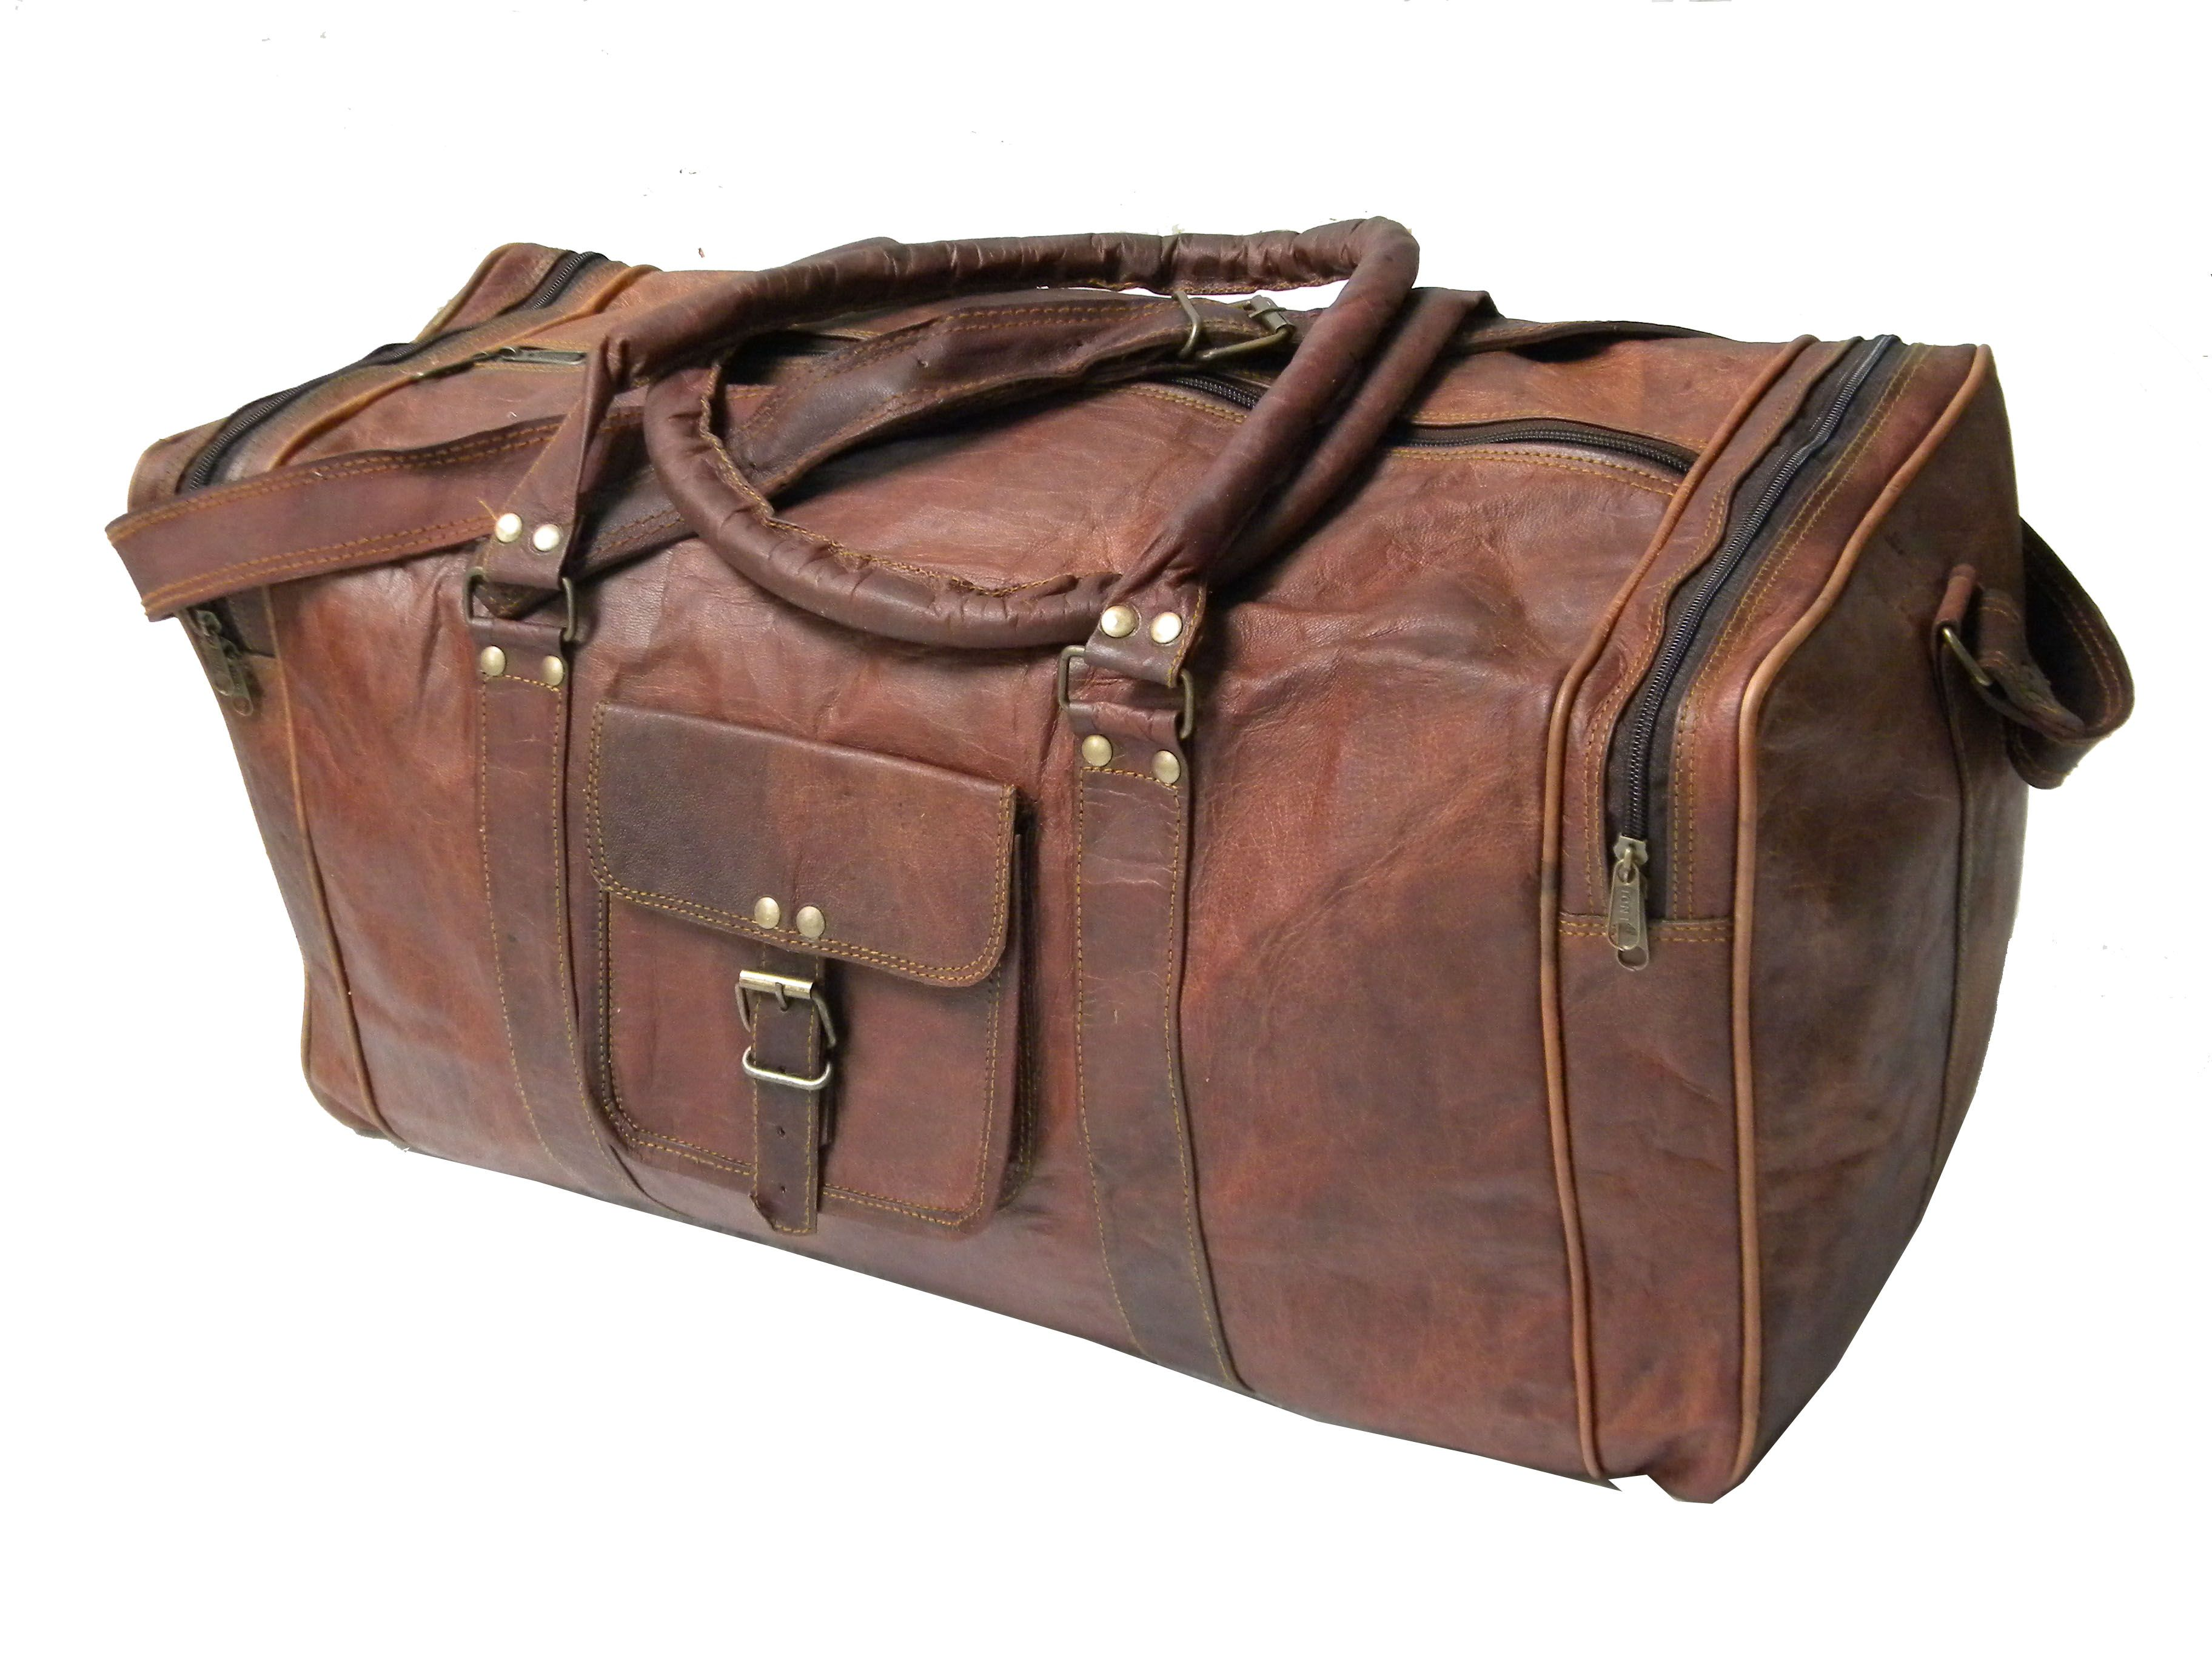 Leather Genuine Travel Bag Duffel Gym Men Vintage Luggage S Overnight Weekend